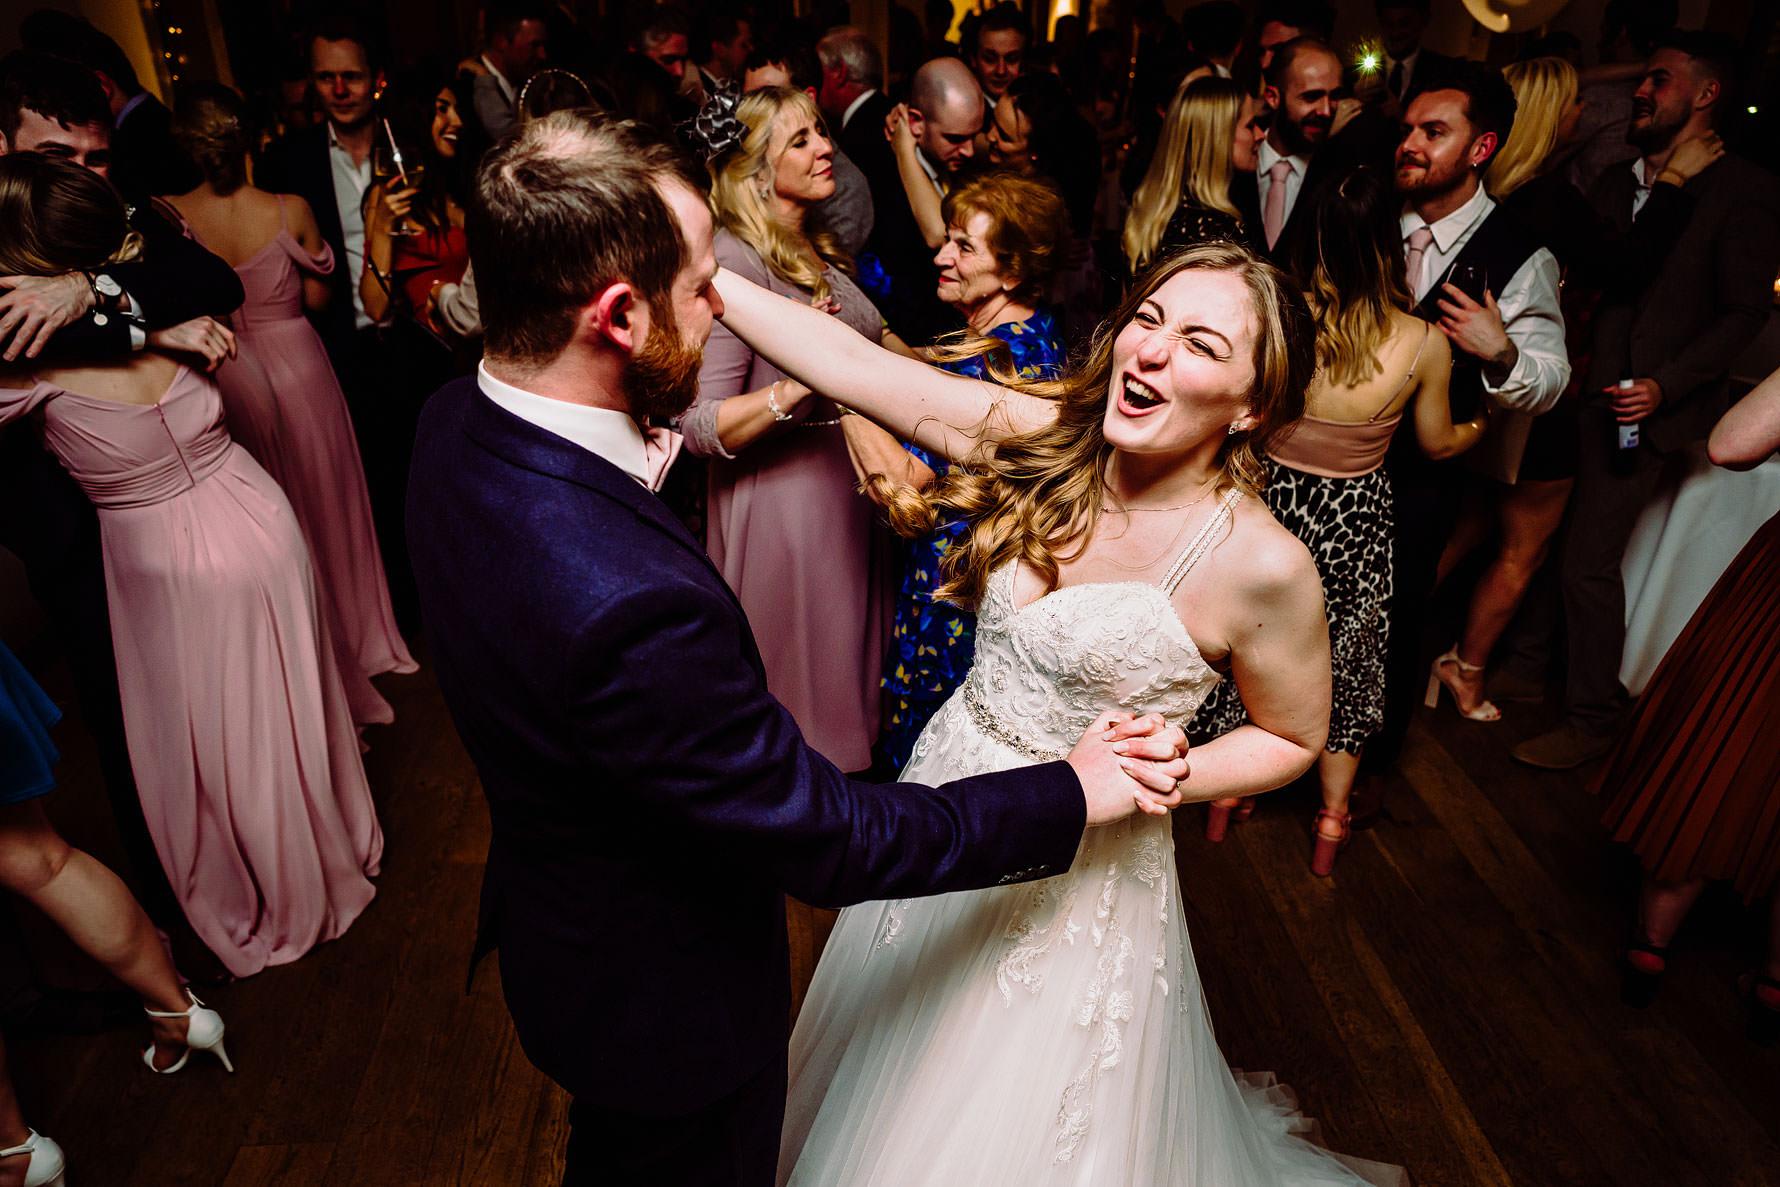 fun on the dance floor at a wedding